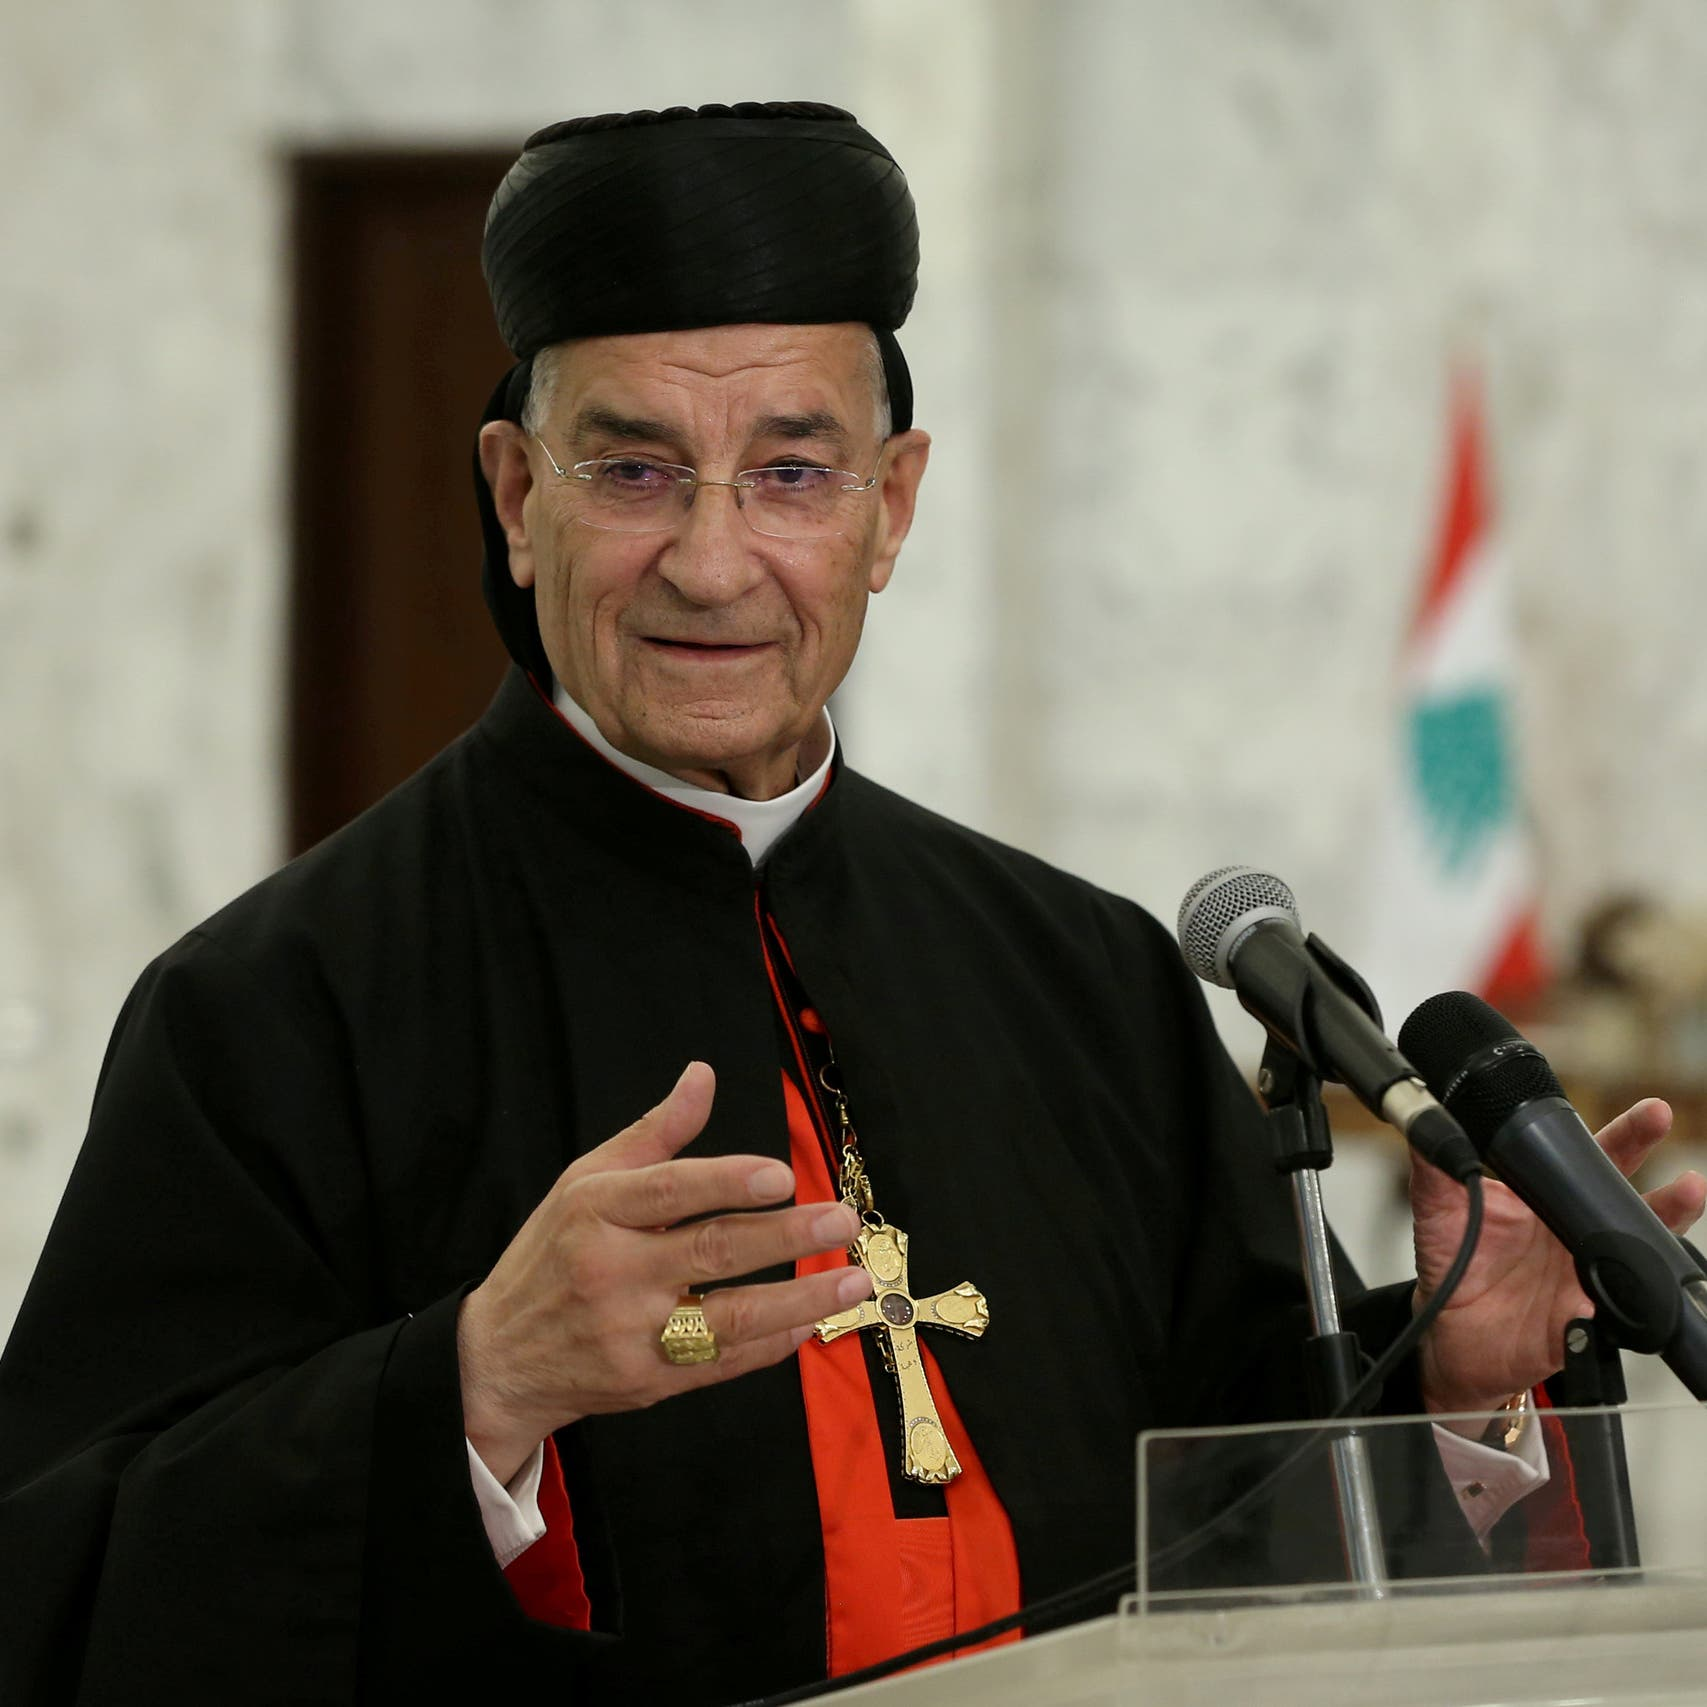 Lebanon's Maronite Patriarch berates politicians as deadlock drags on